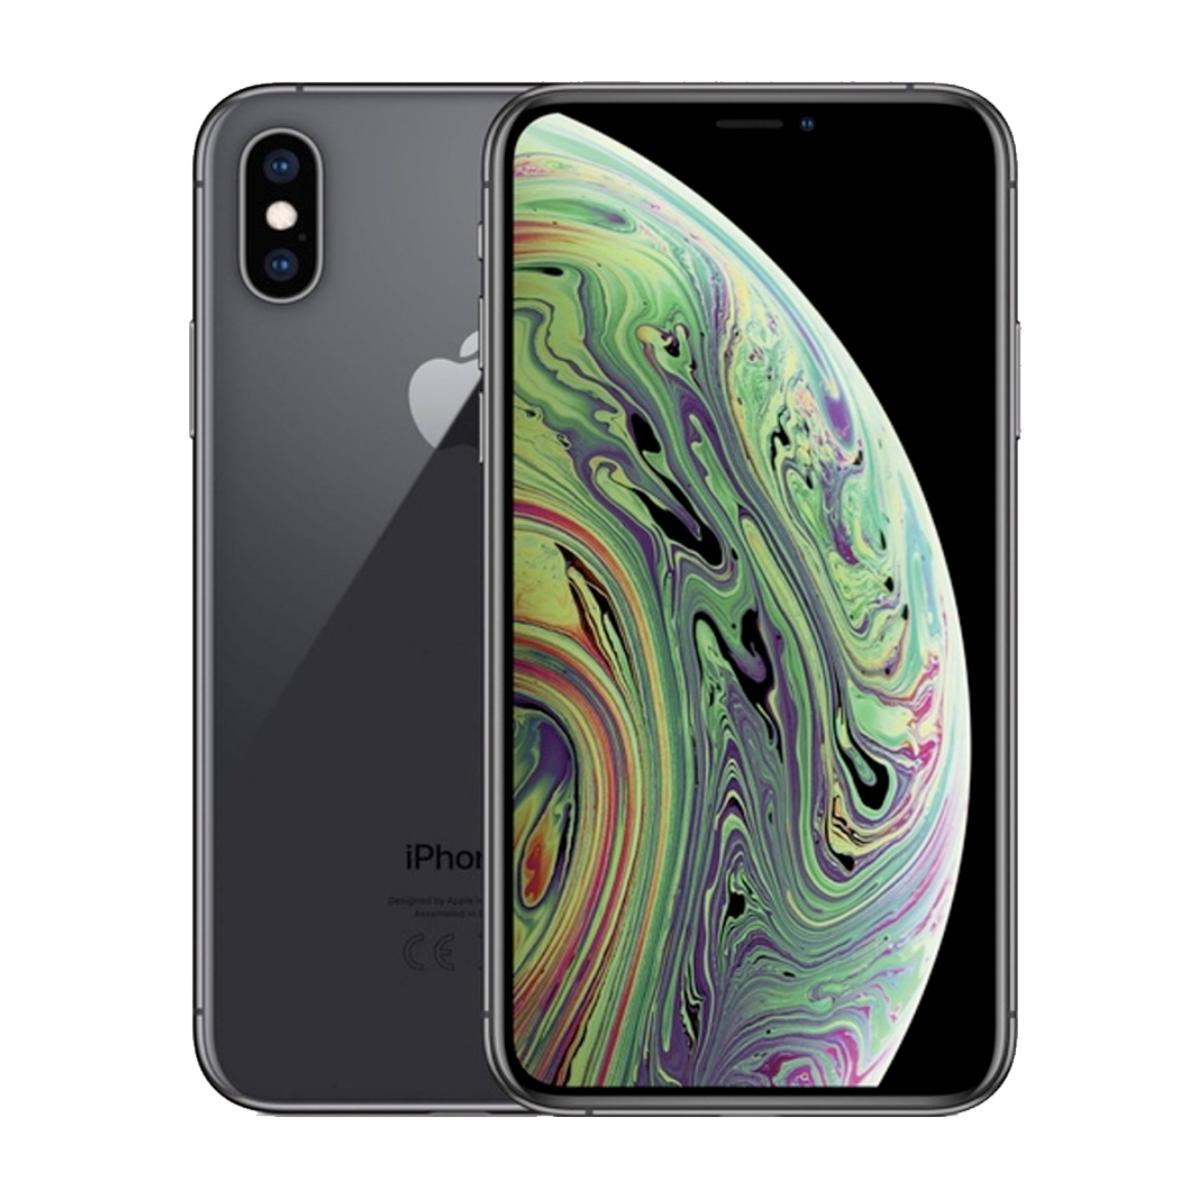 Sim Free iPhone Xs 256GB Unlocked Mobile Phone - Space Grey